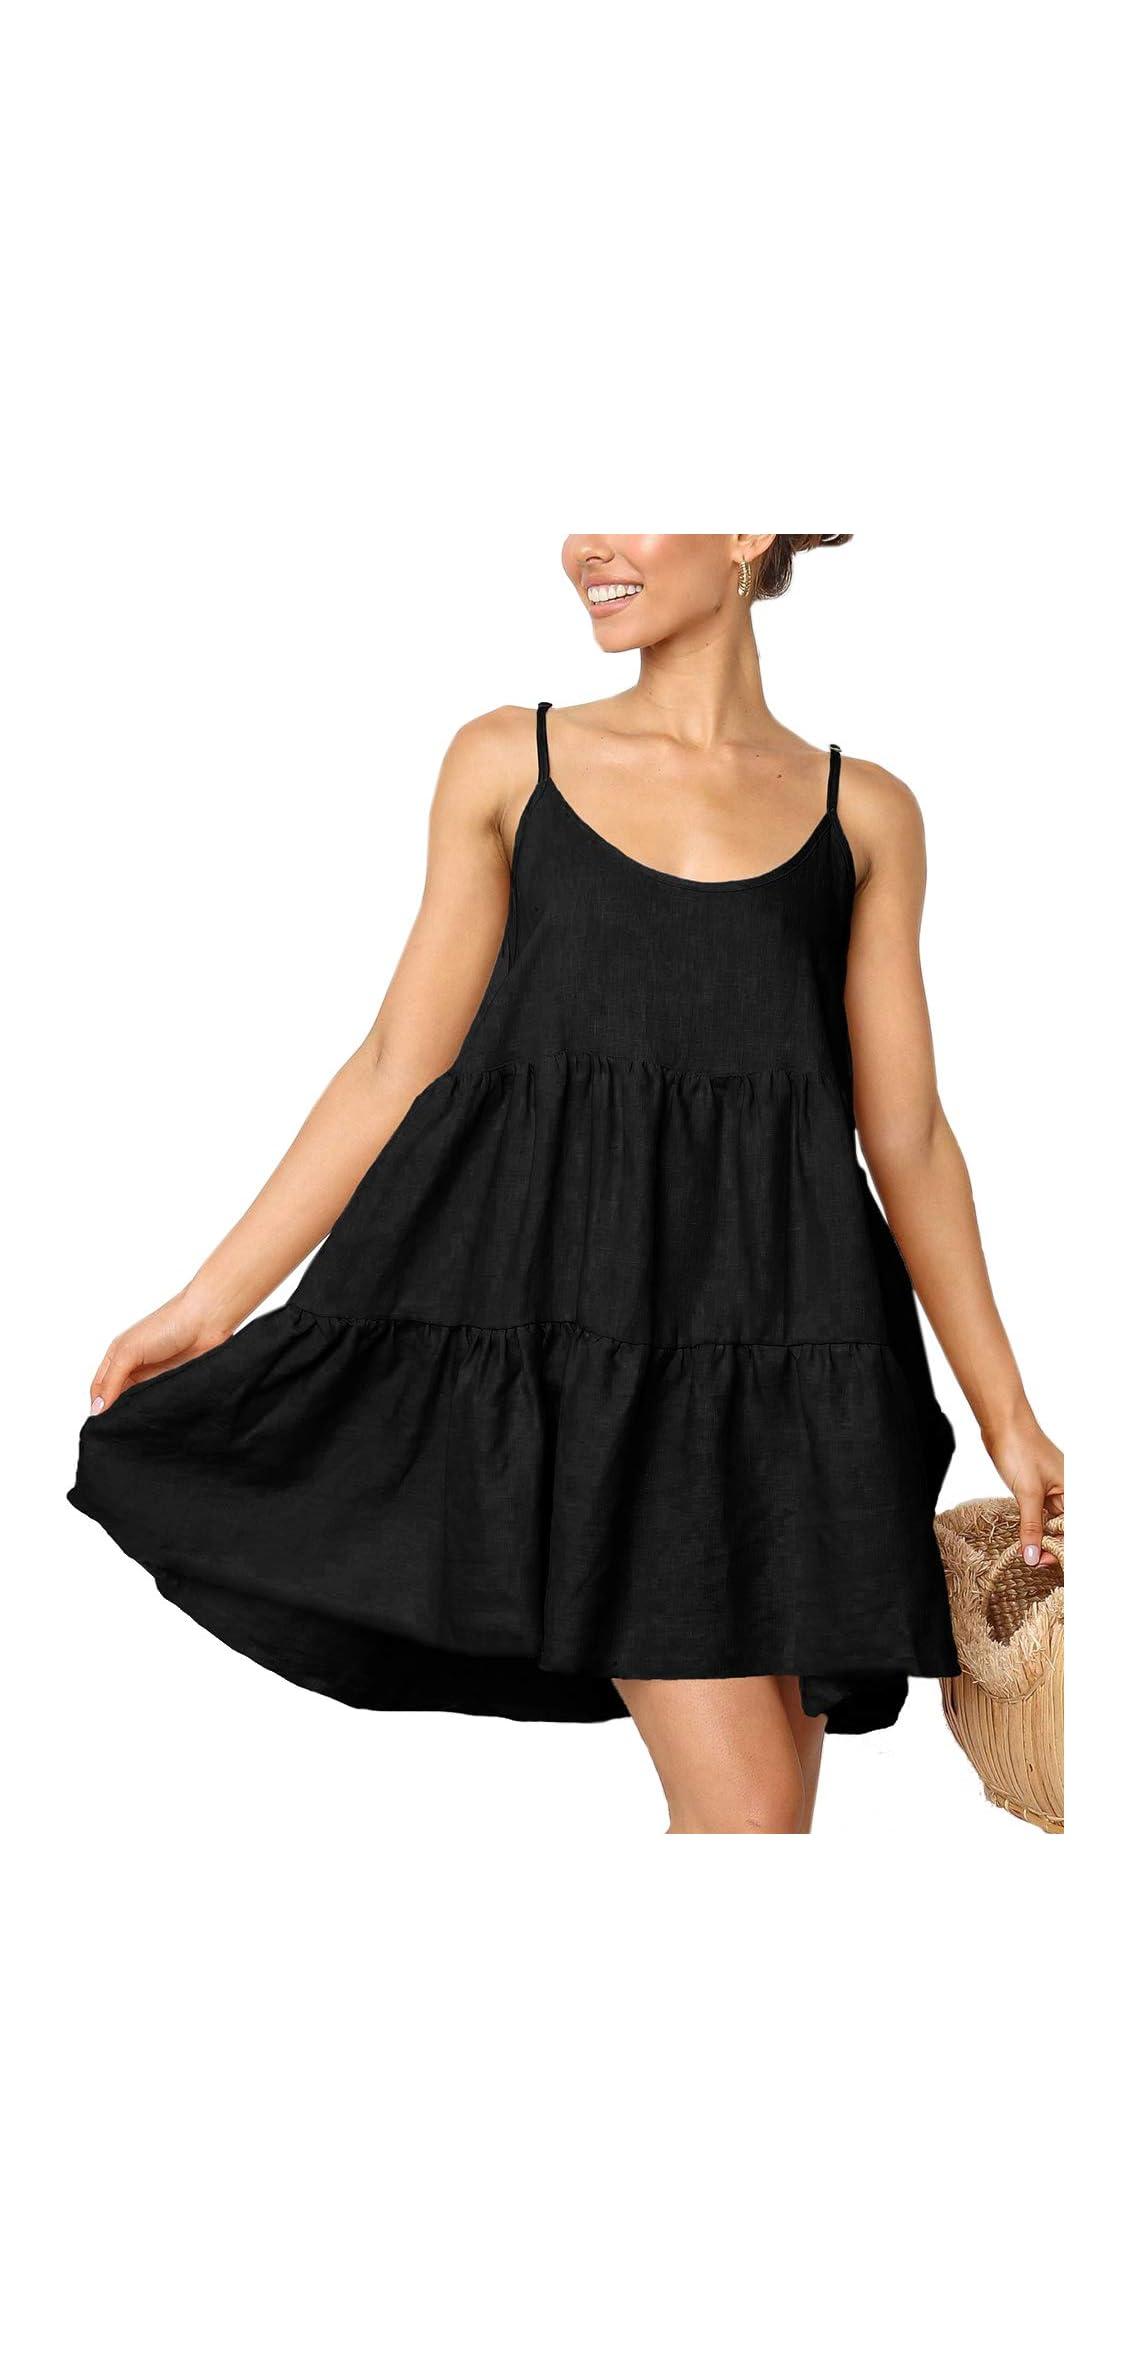 Spaghetti Strap Dress For Women Pleated Swing Dress Casual